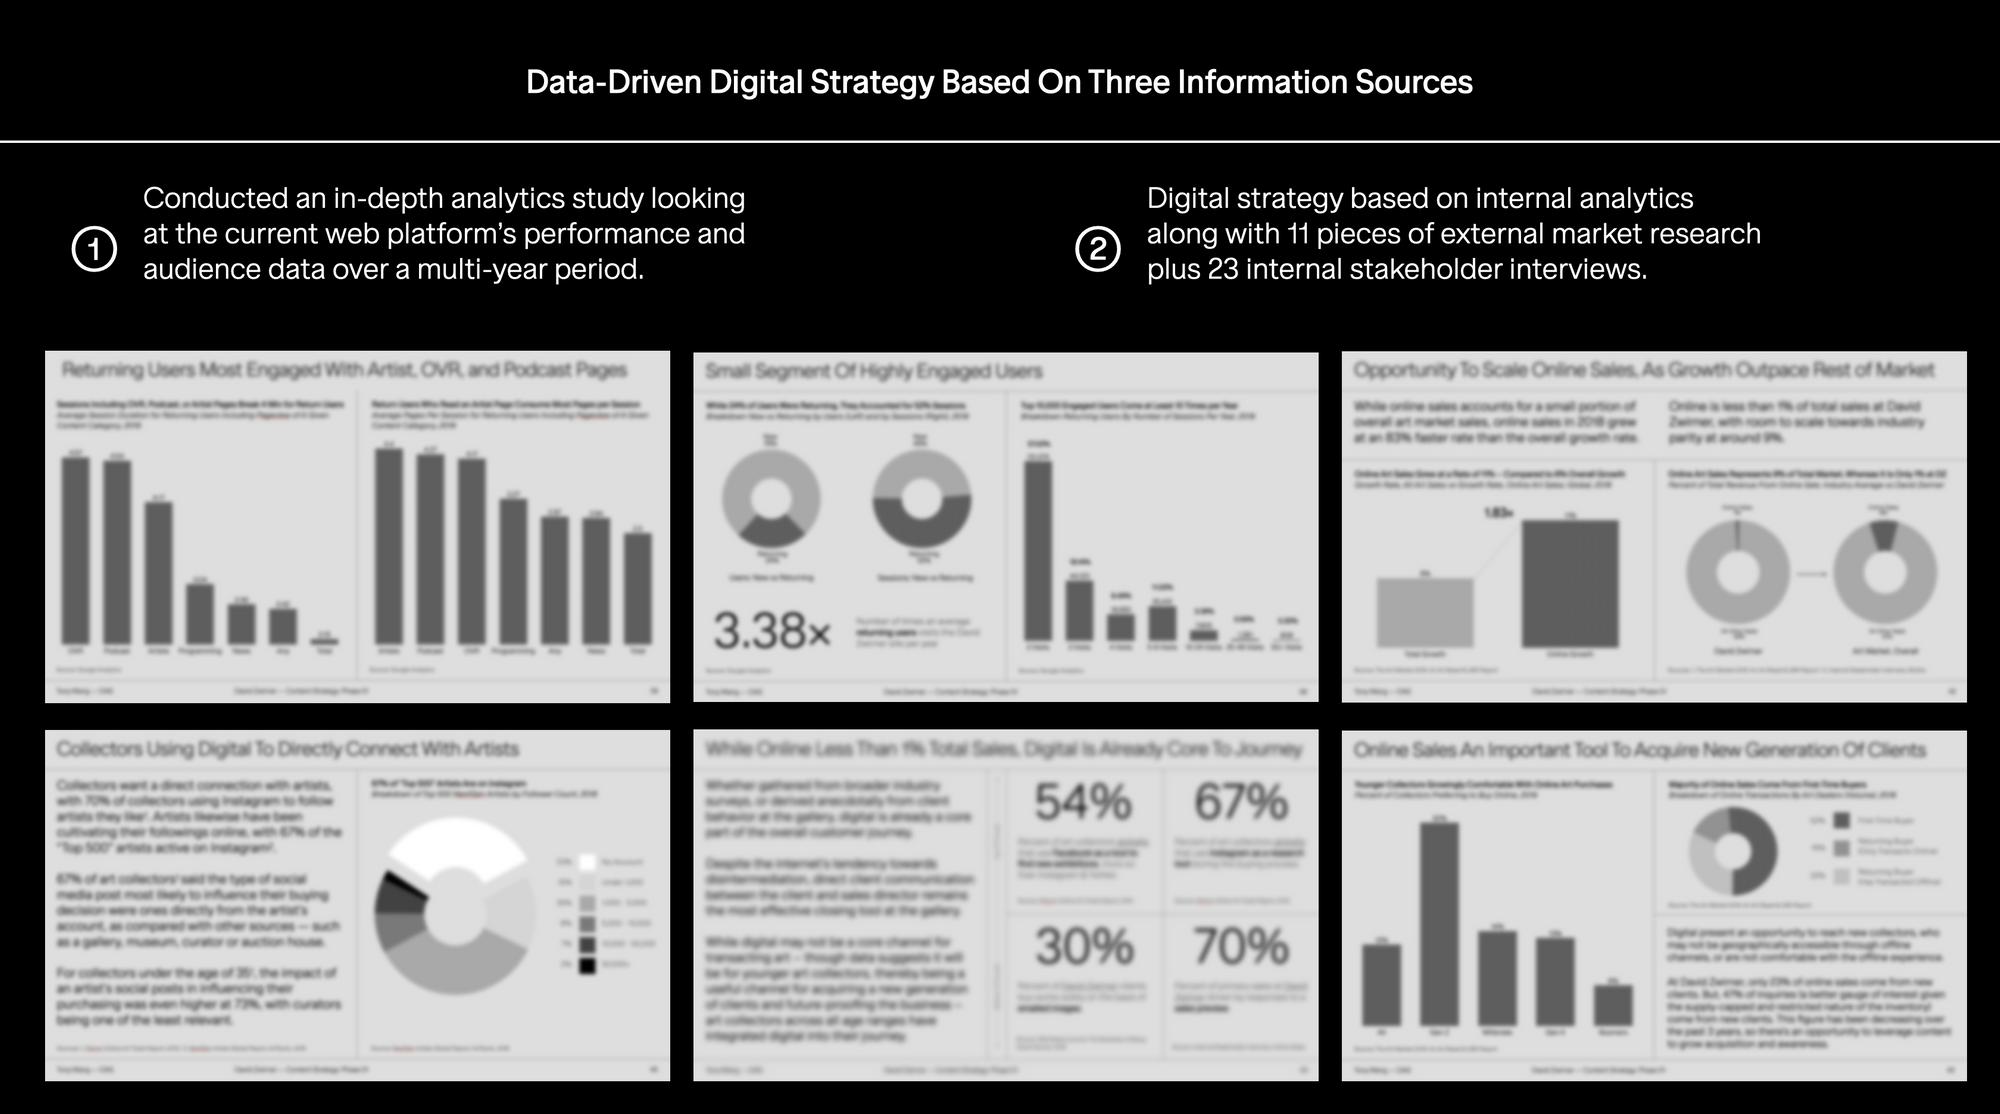 David Zwirner: Digital Strategy